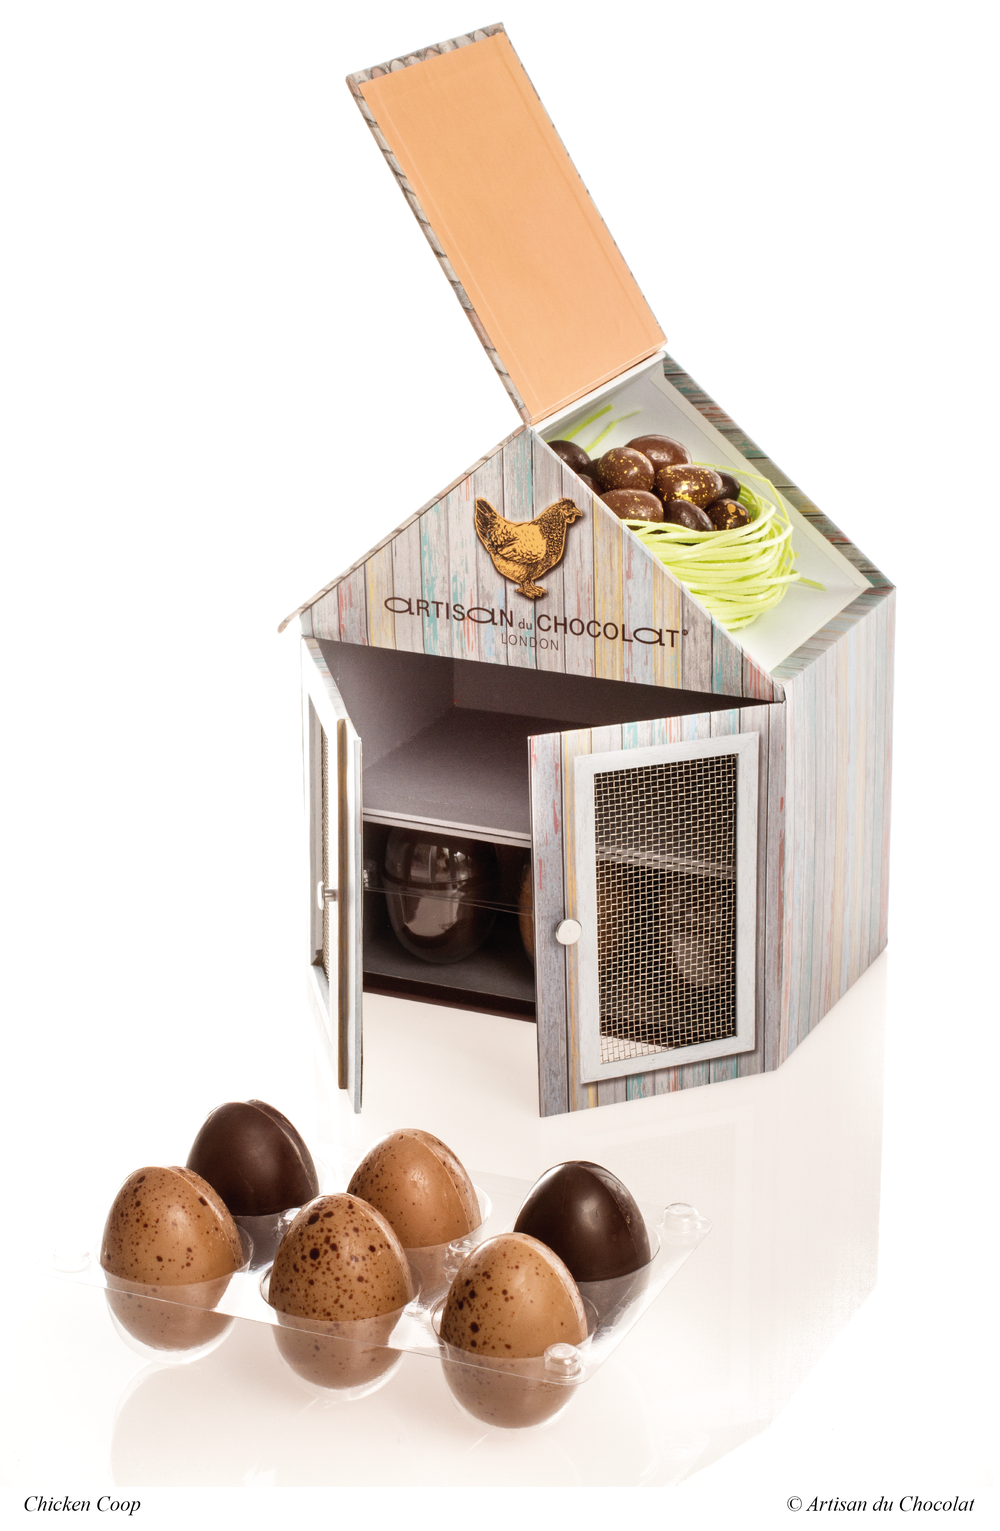 Chocolate easter egg artisan du chocolat easter chicken coop on chocolate chocolate easter egg negle Images